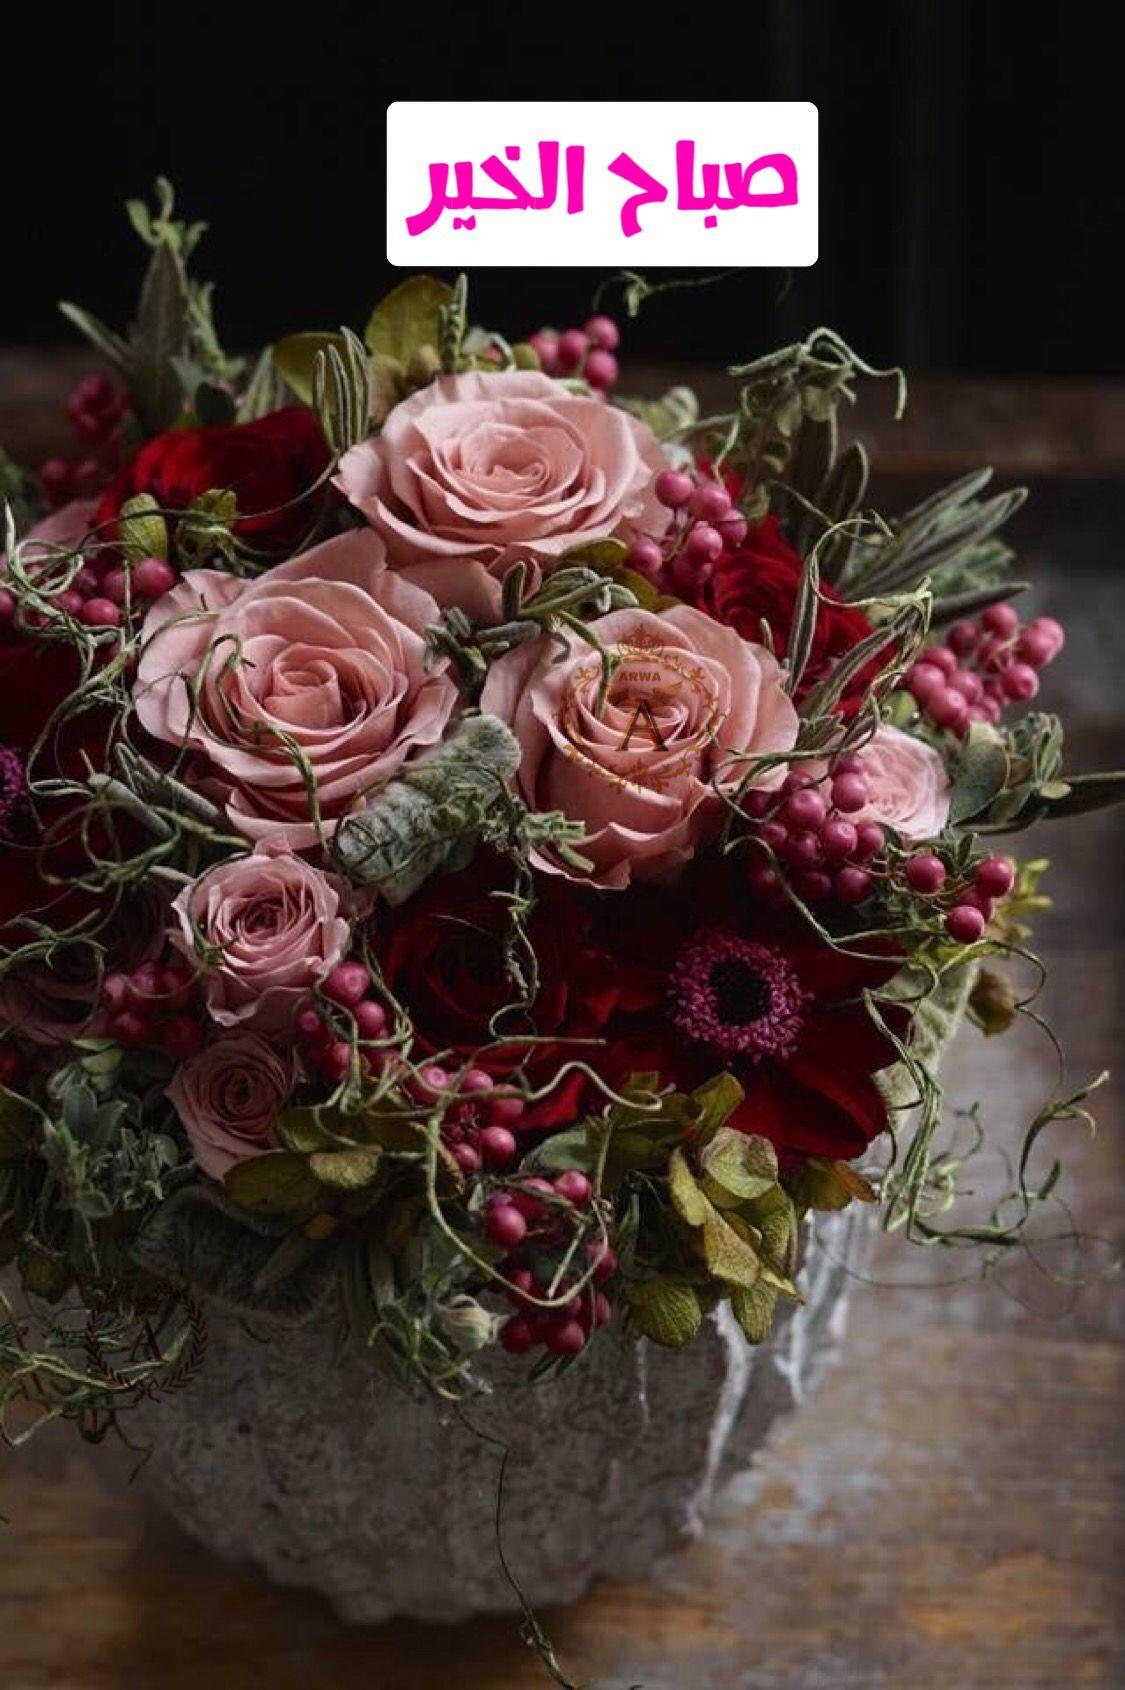 صباح الخير Flower Decorations Flower Arrangements Floral Arrangements